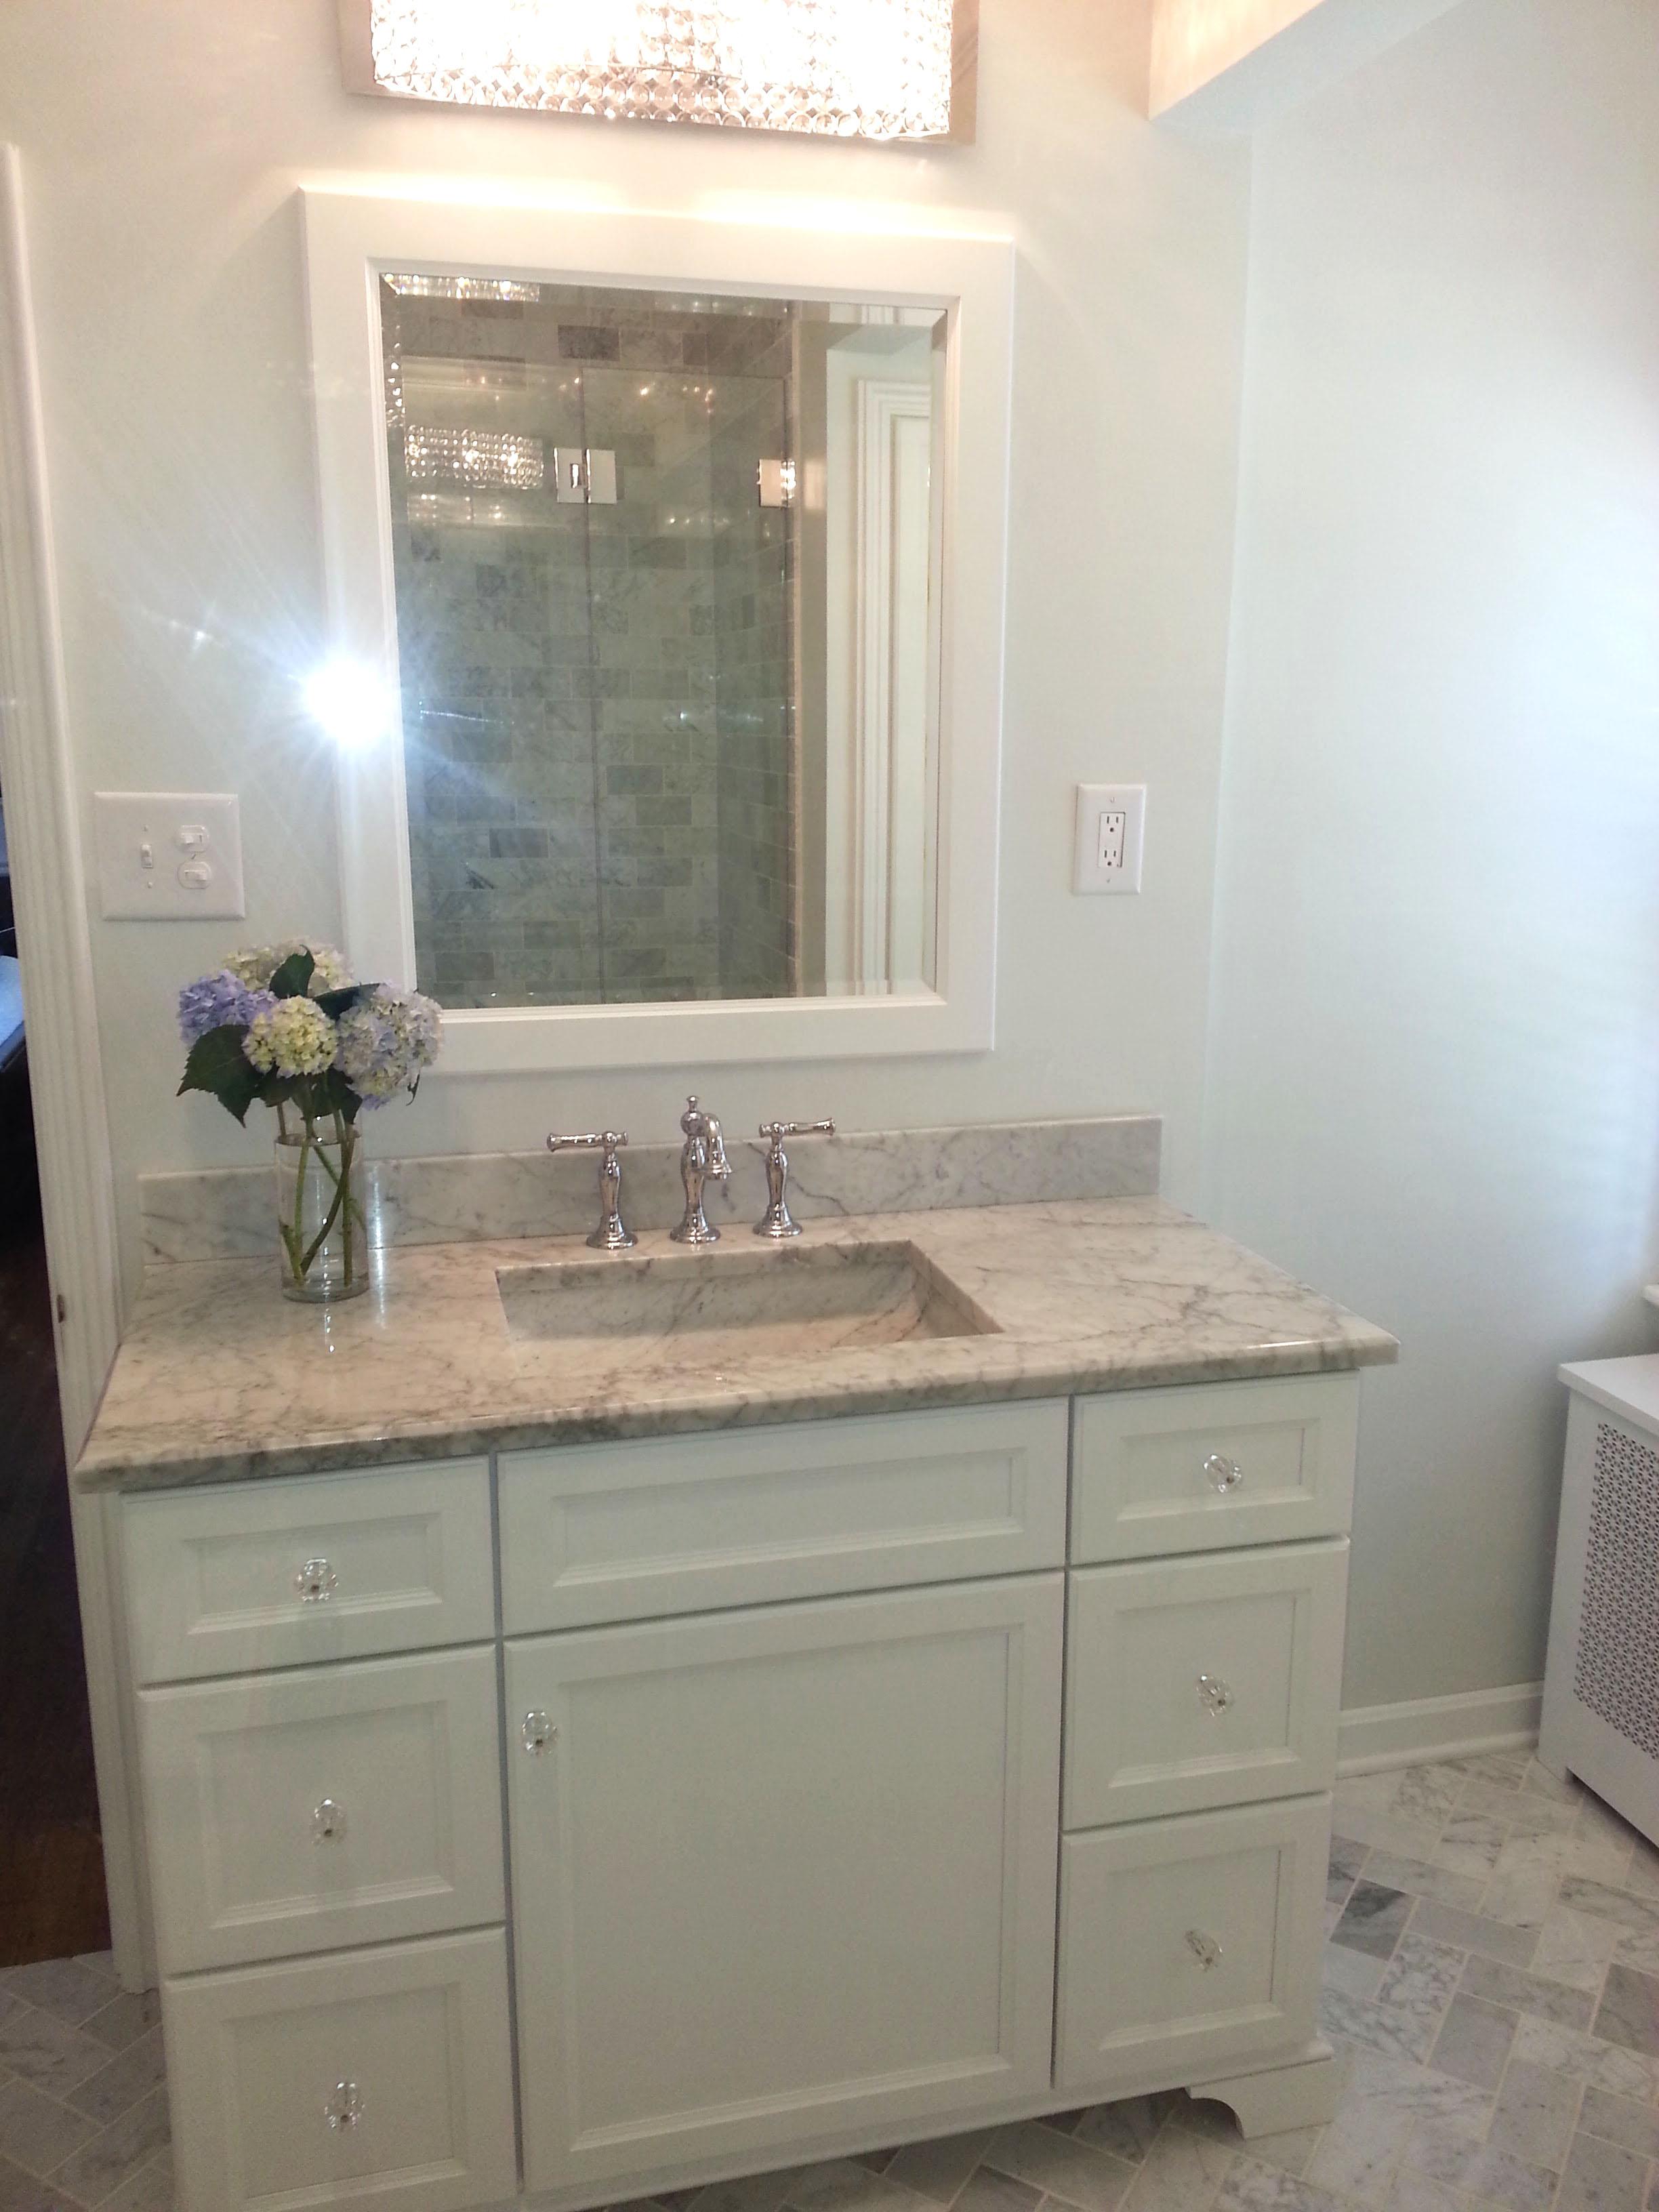 Hutch carrara bathroom 2.jpg